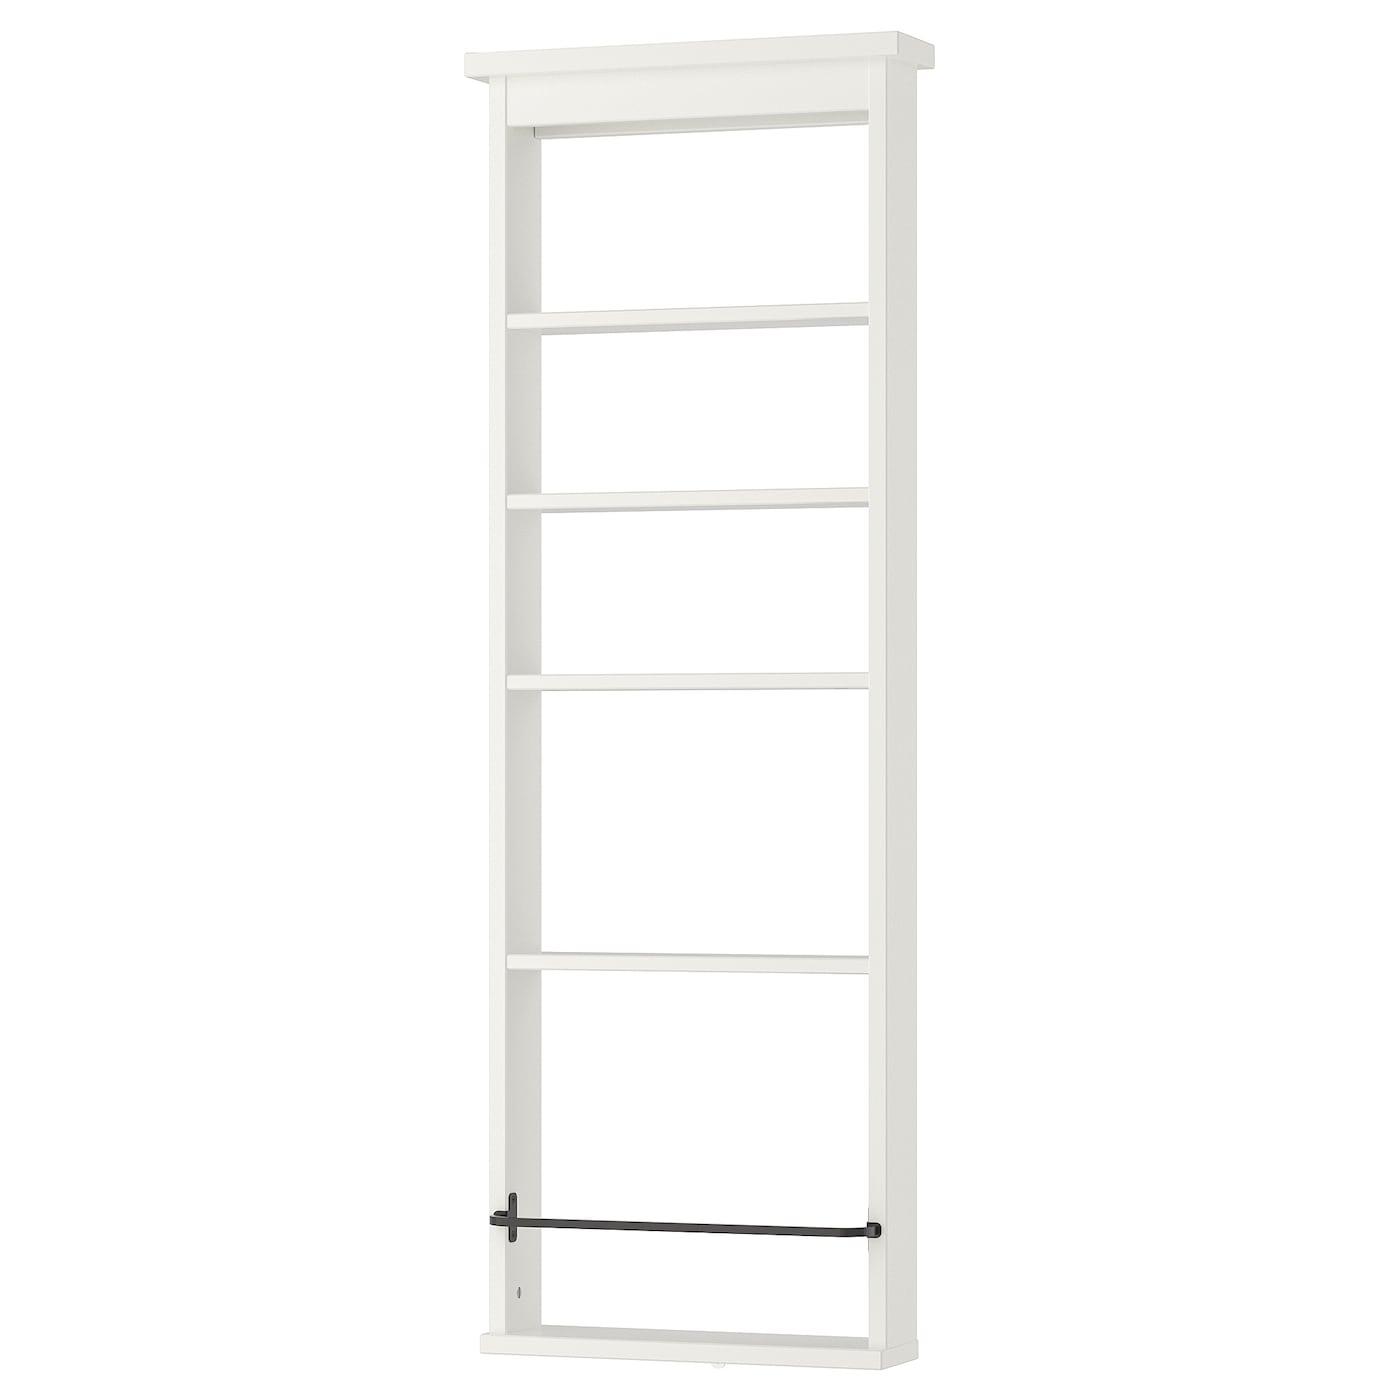 Hemnes Vaeghylde Hvid 42x118 Cm Ikea